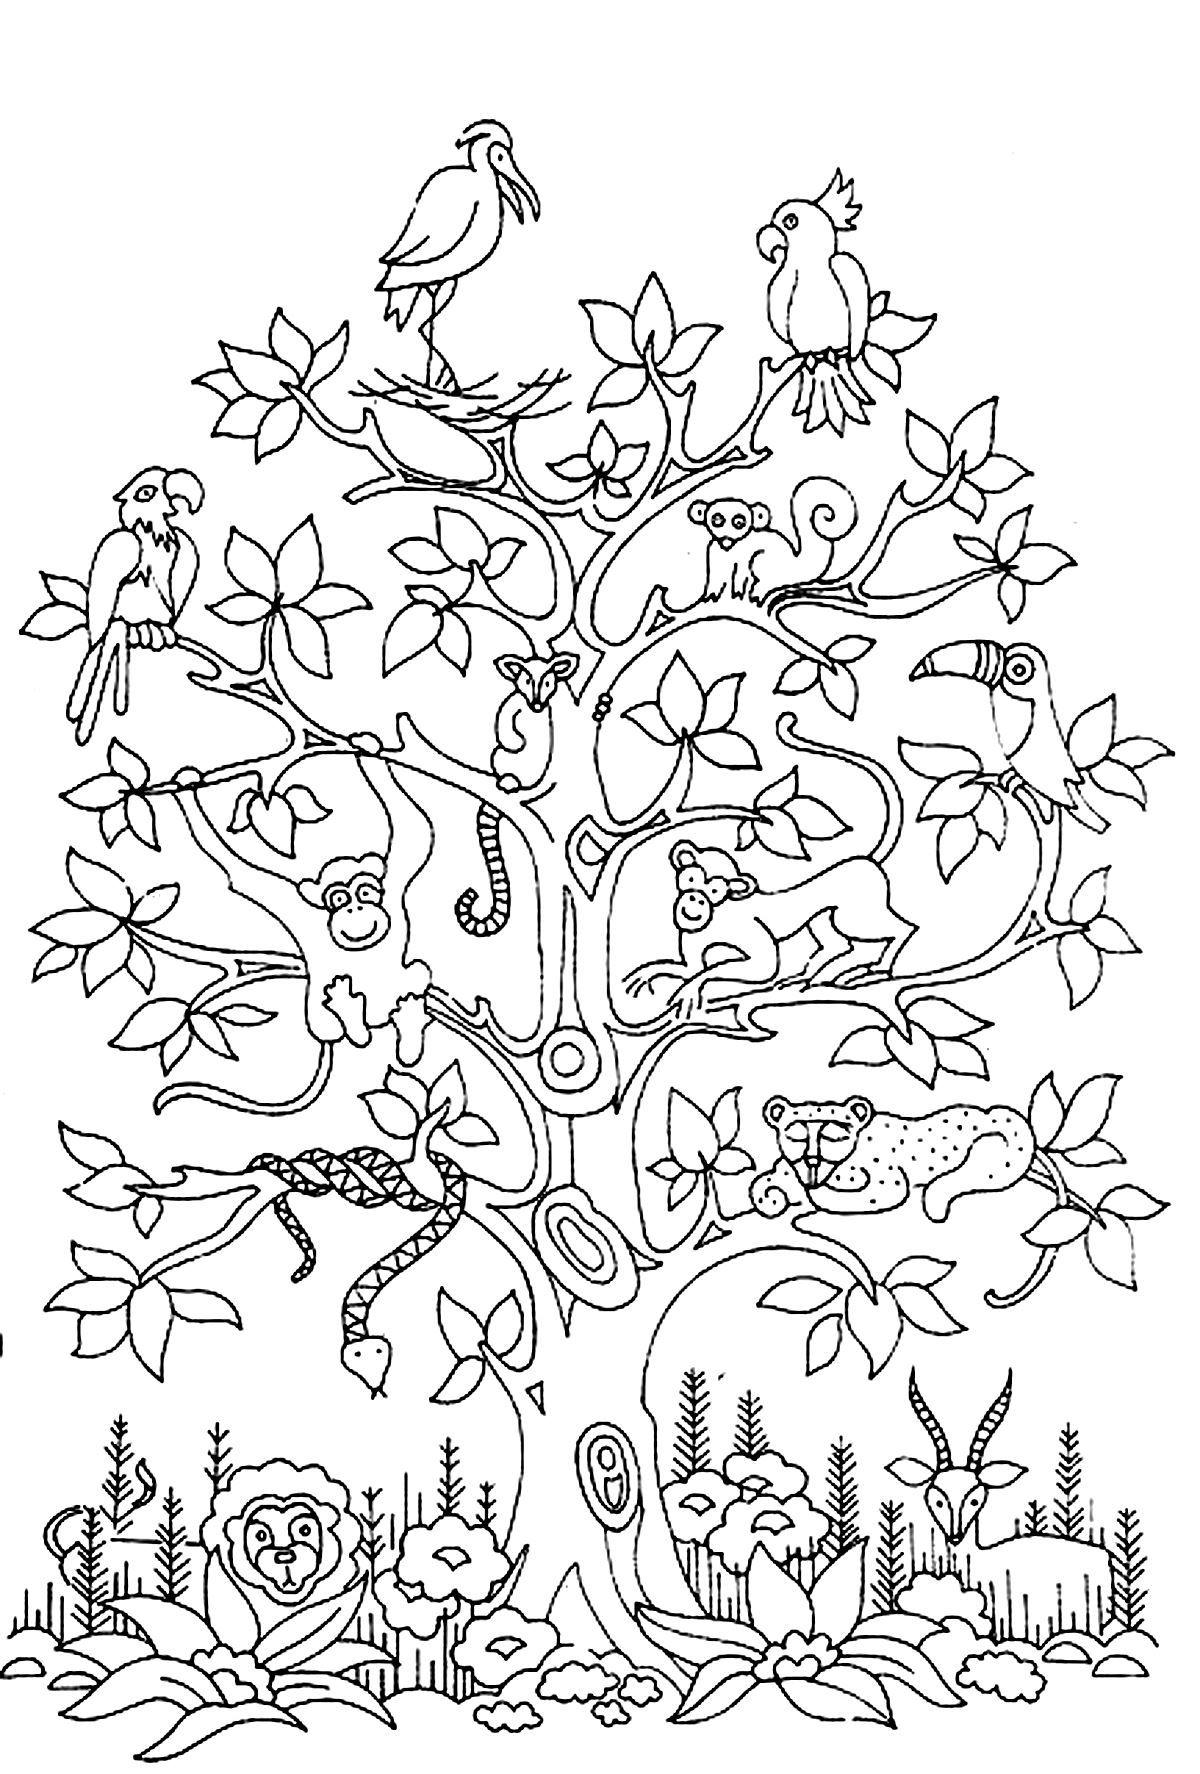 Malvorlagen Baum Ausmalbilder 2002599 AffeFreundcom La